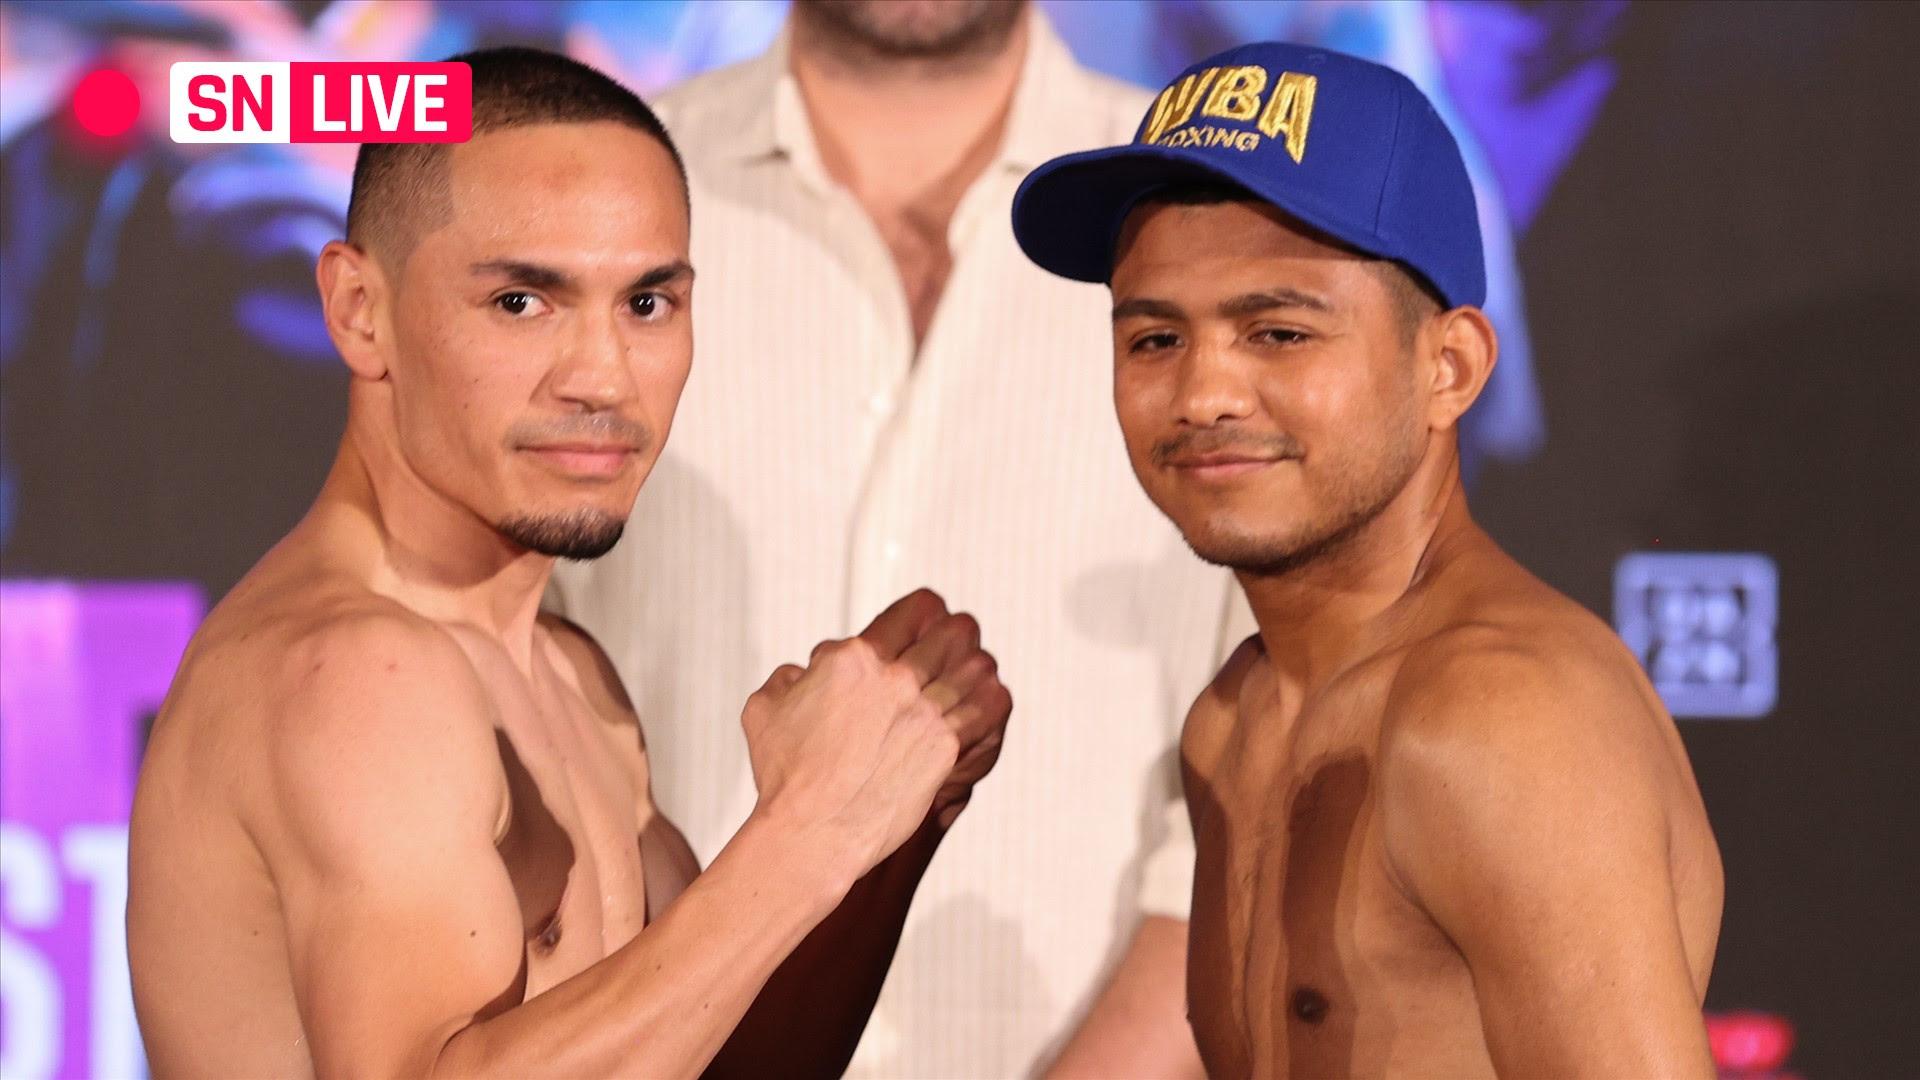 Estrada vs. Chocolatito 2: Live updates, results & highlights from the full Juan Francisco Estrada-Roman Gonzalez card